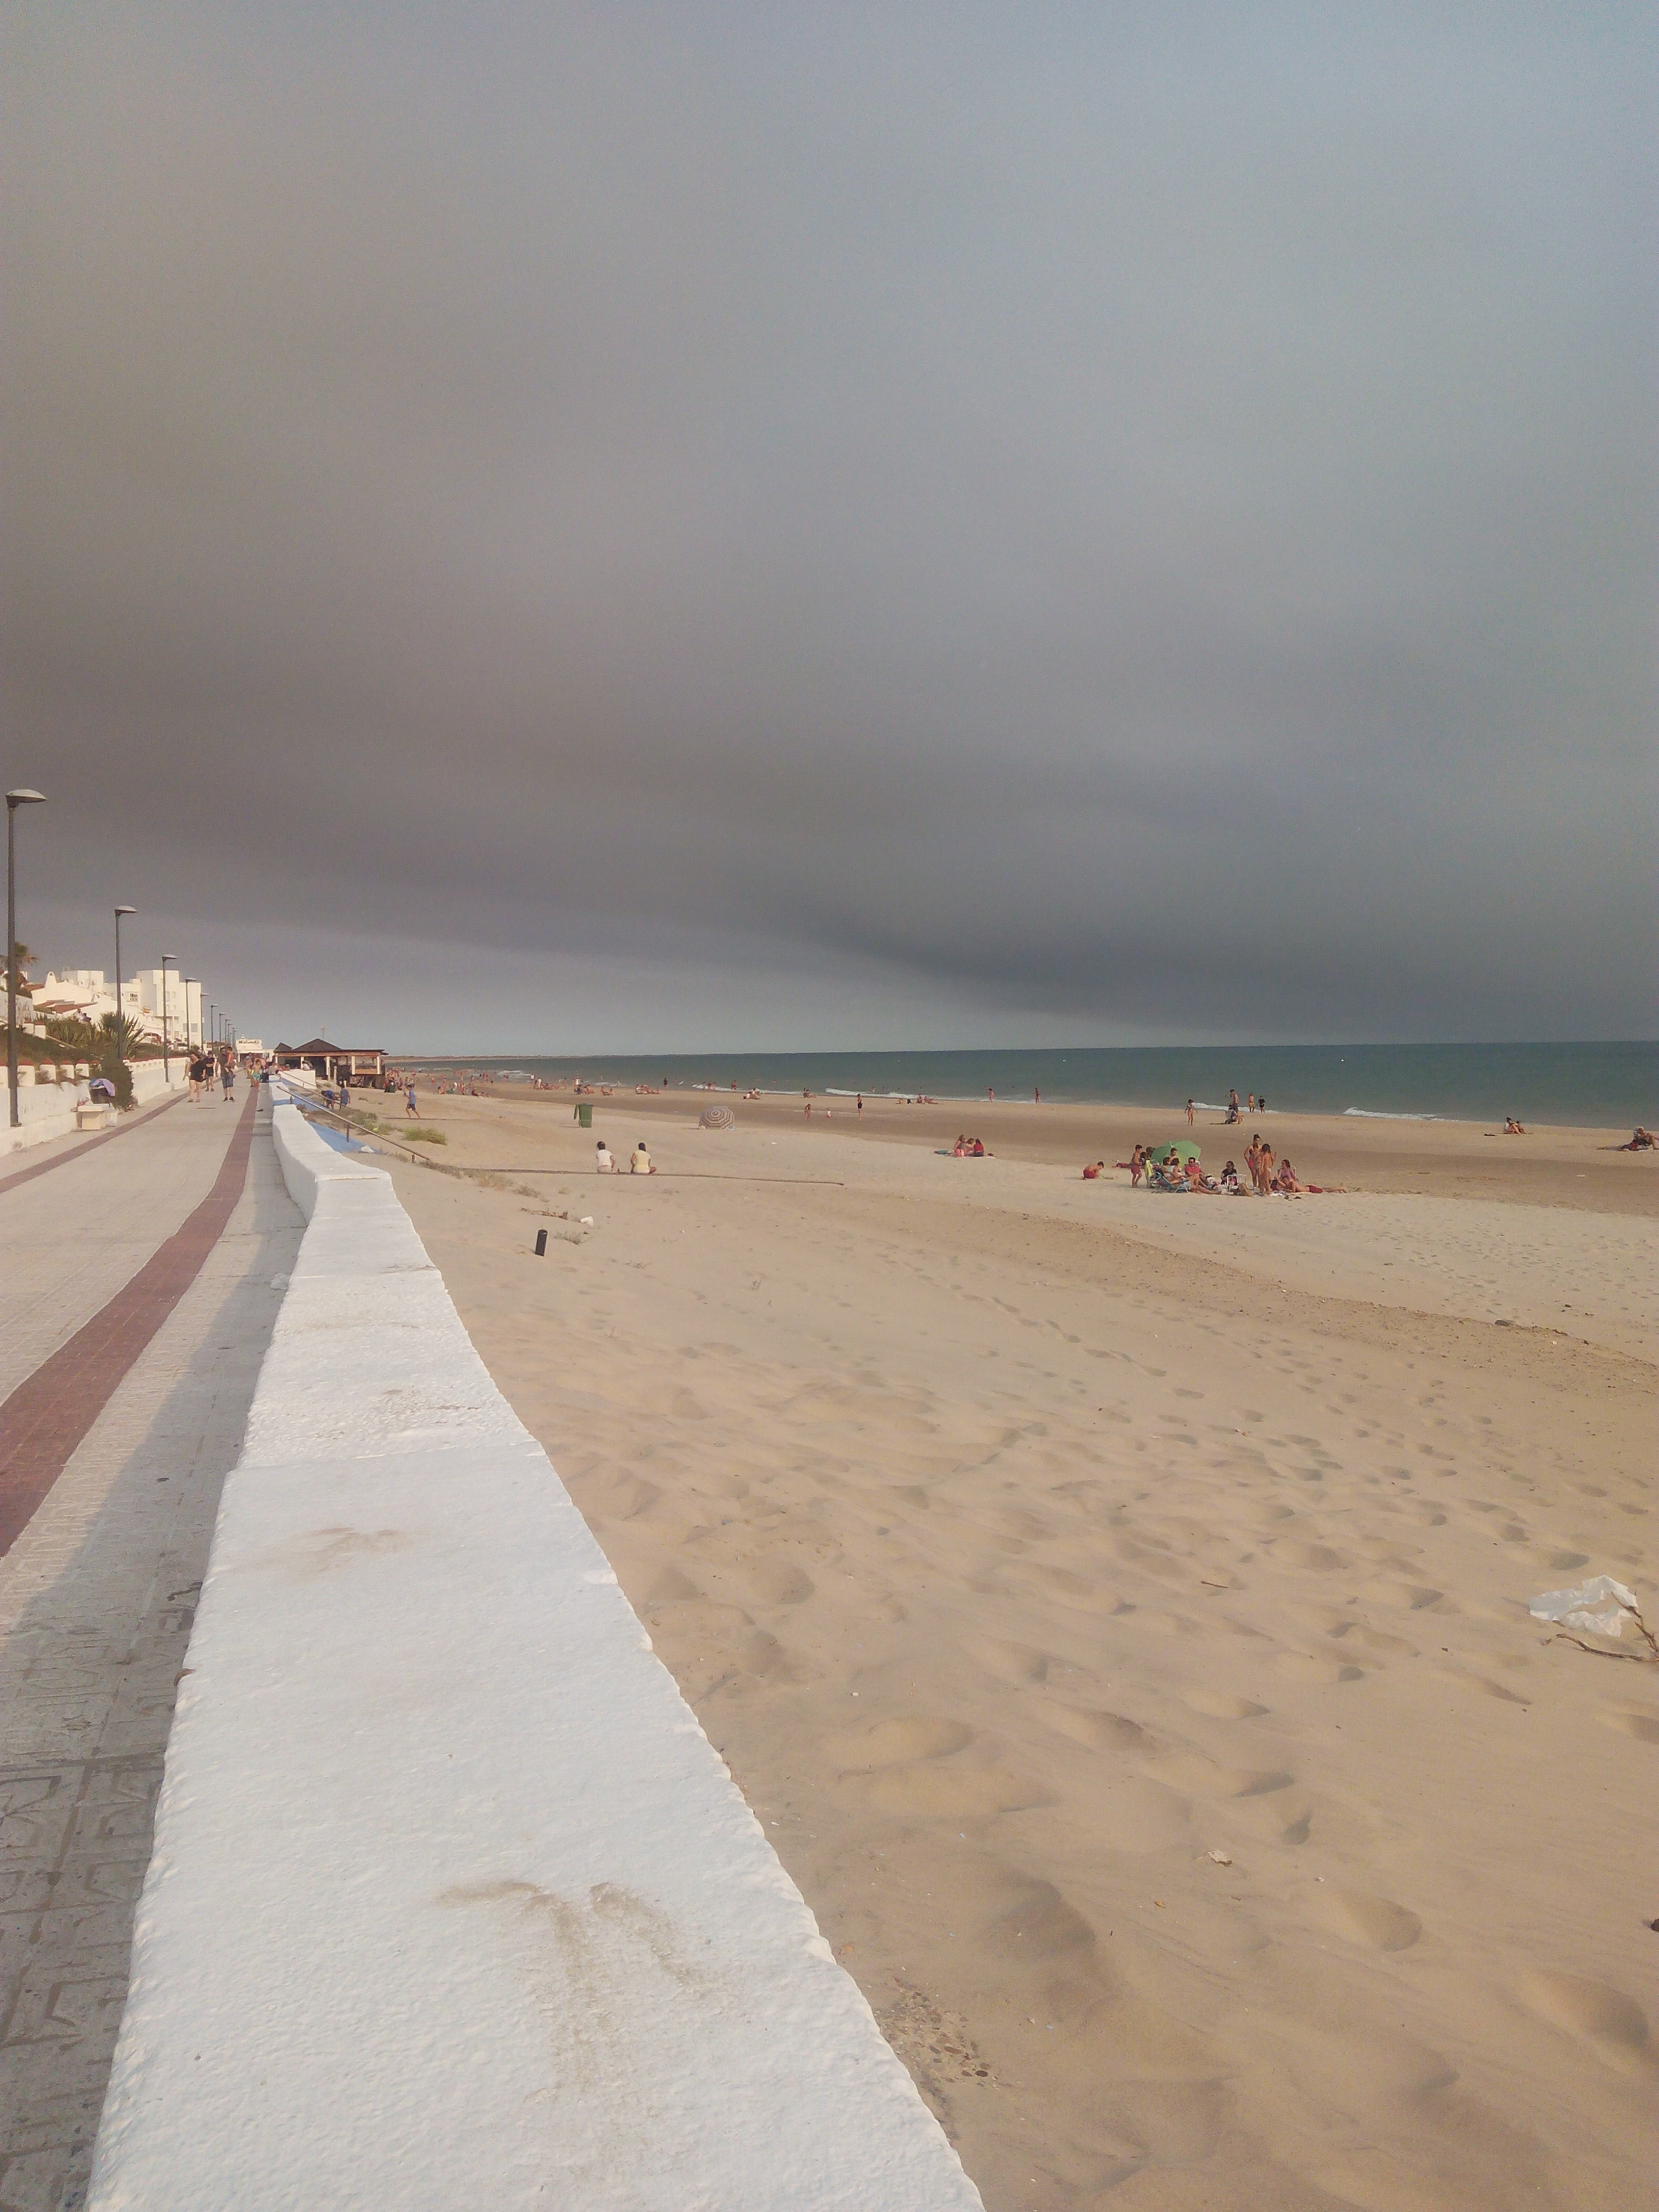 Estoy en Matalascañas mientras arde Doñana